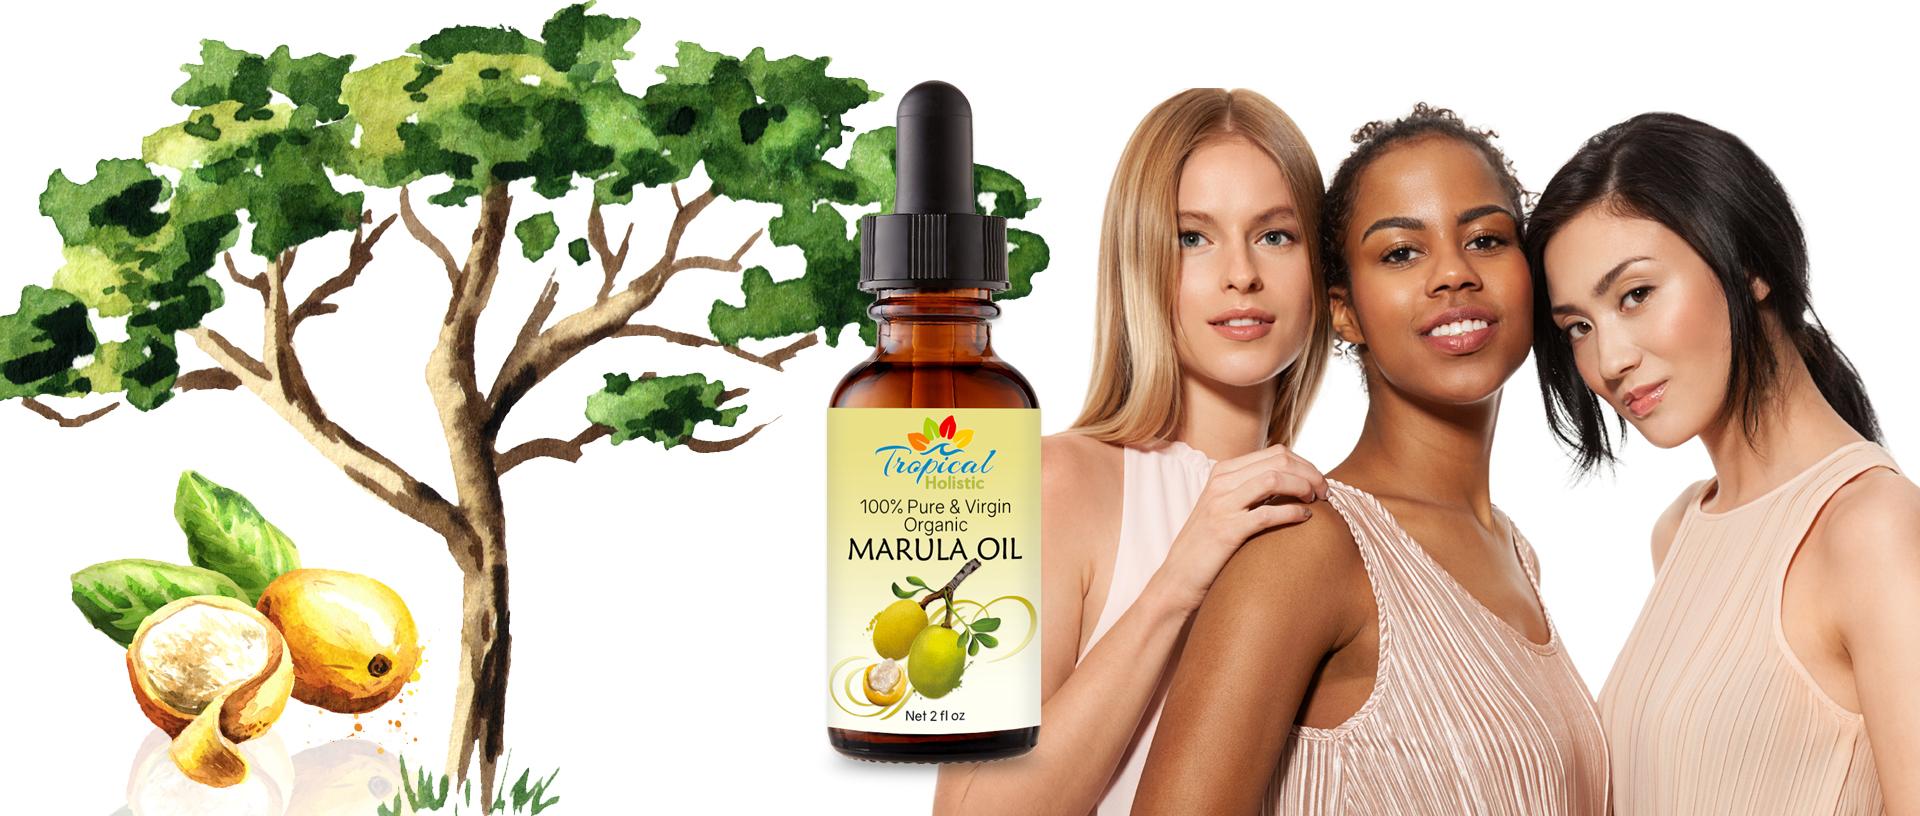 organic marula oil